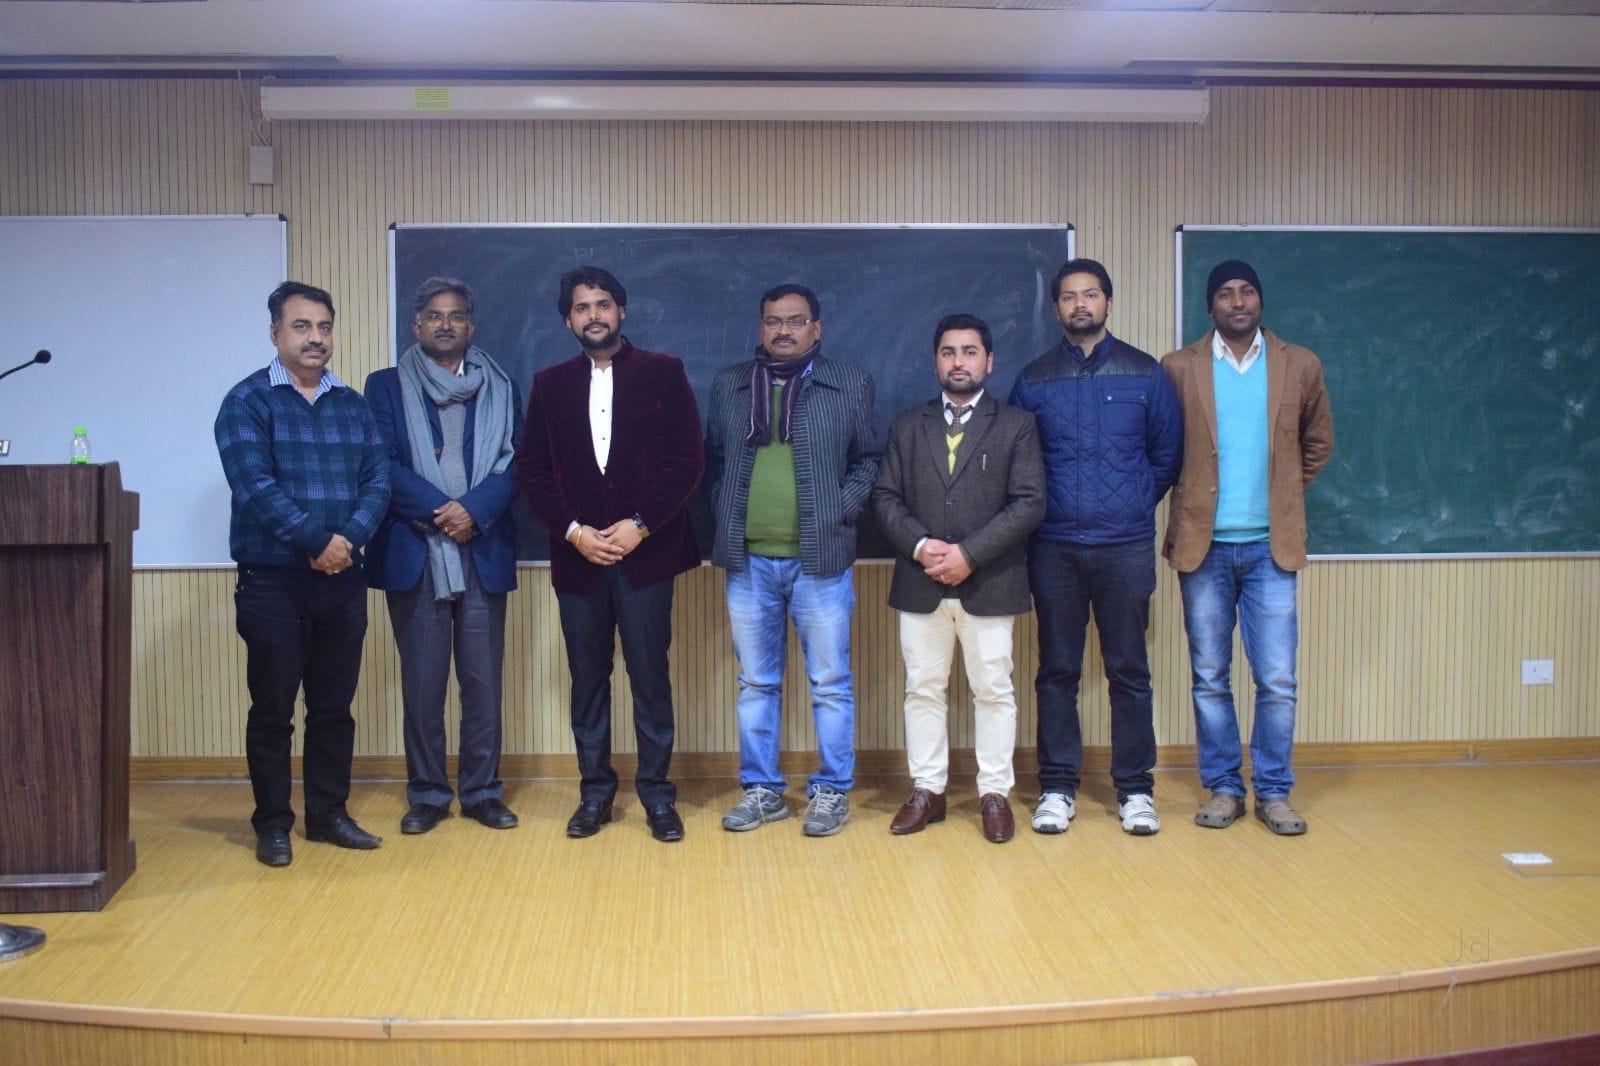 Top Tutorials For Ias Entrance in Jalandhar - Best Ias Coaching